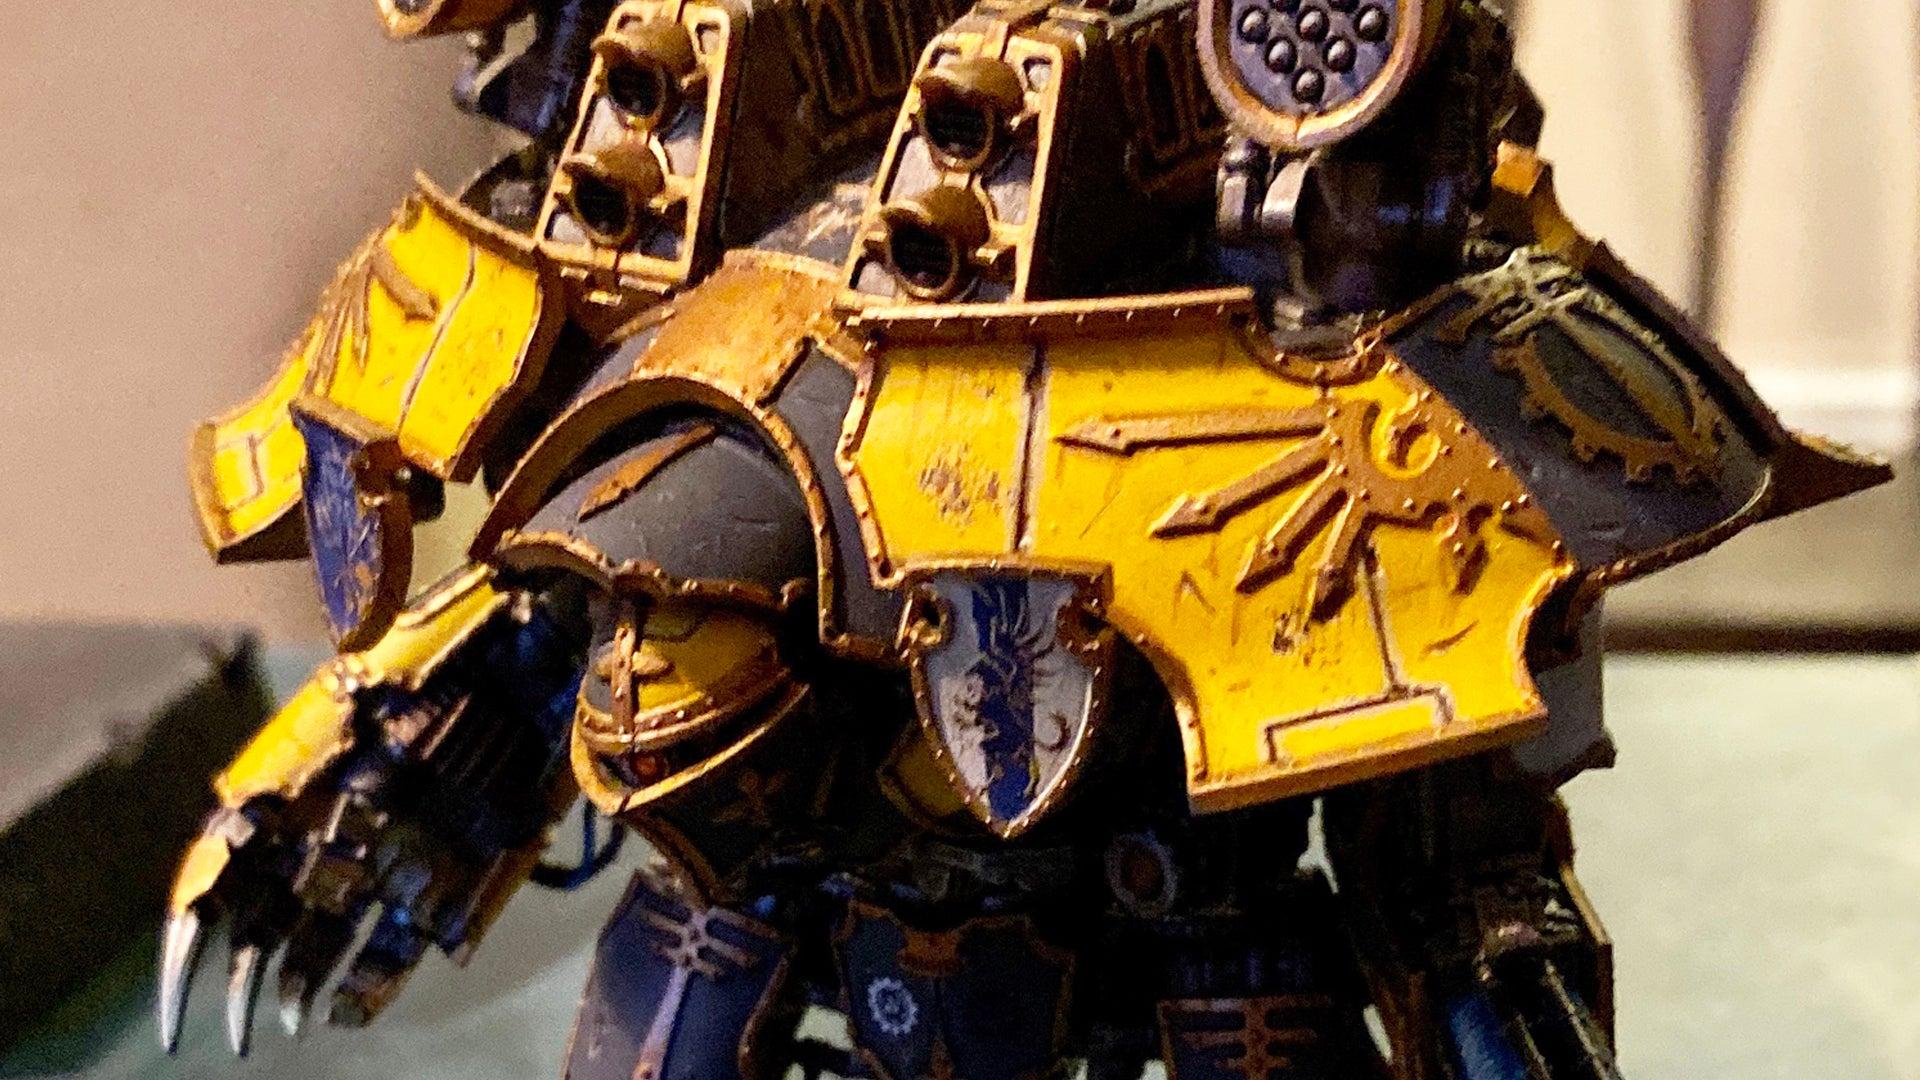 warhammer-40k-adeptus-titanicus-7.jpg